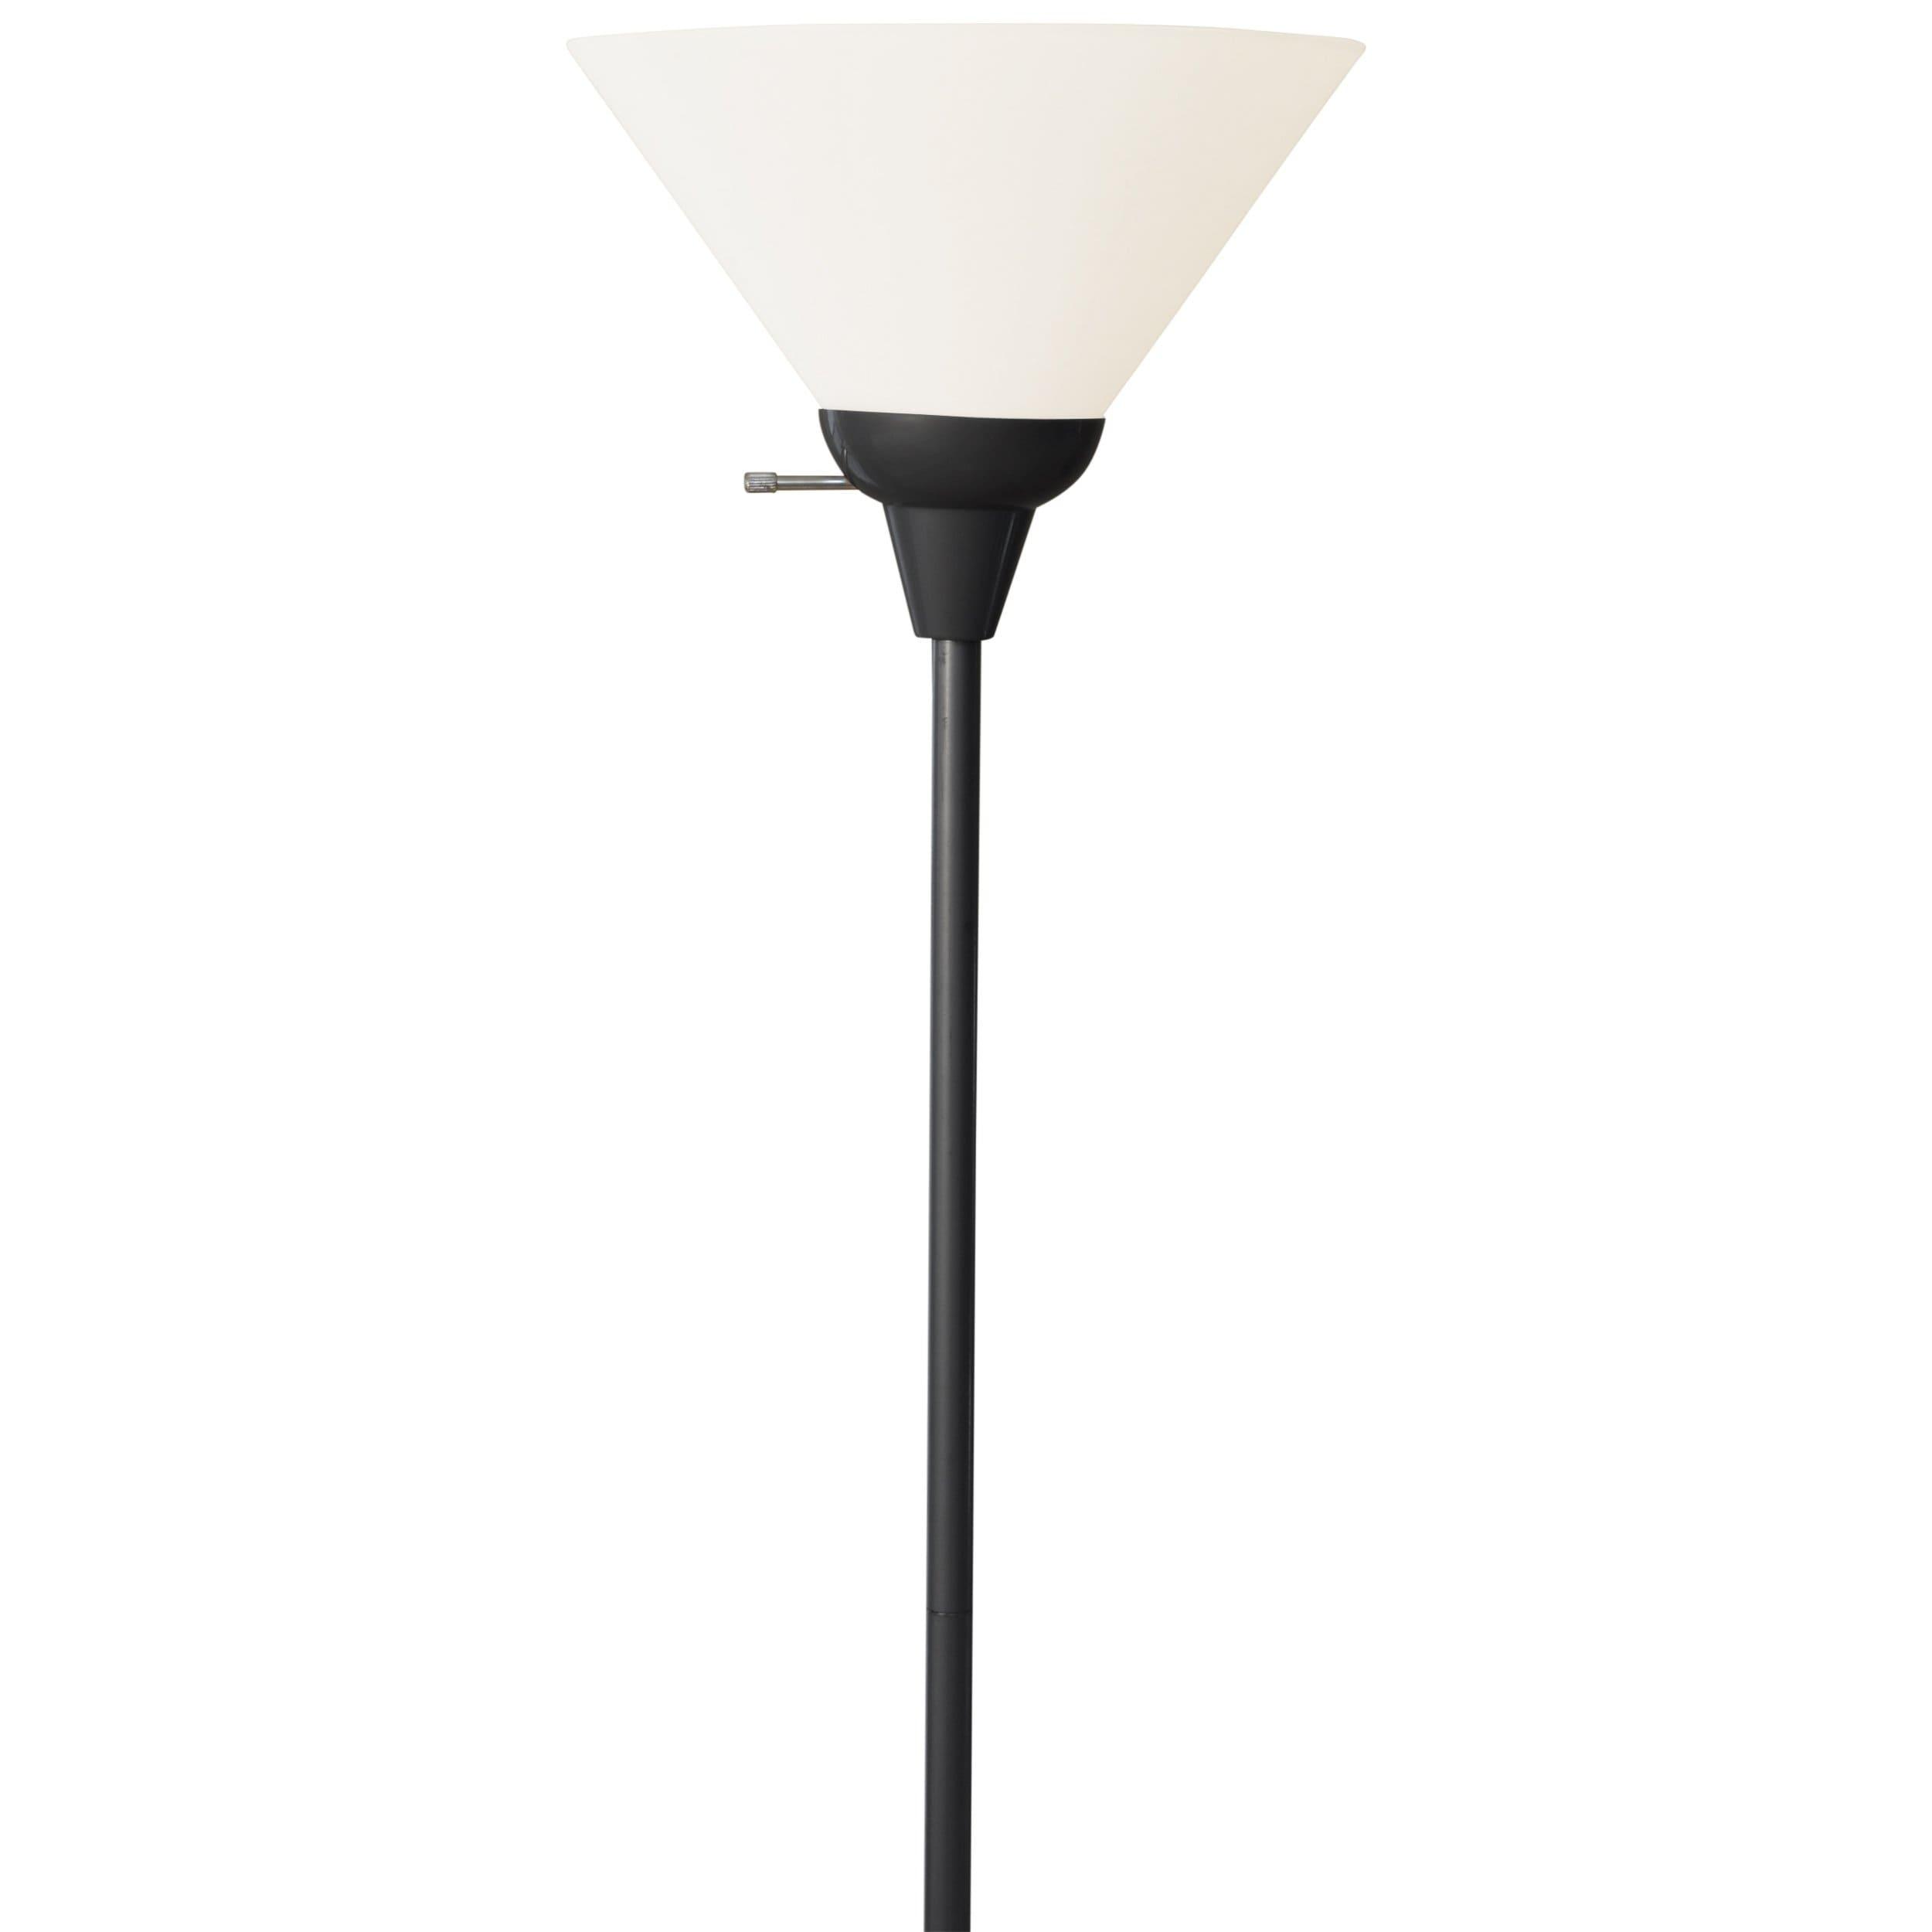 150 Watt Floor Lamp 72 Inches Tall